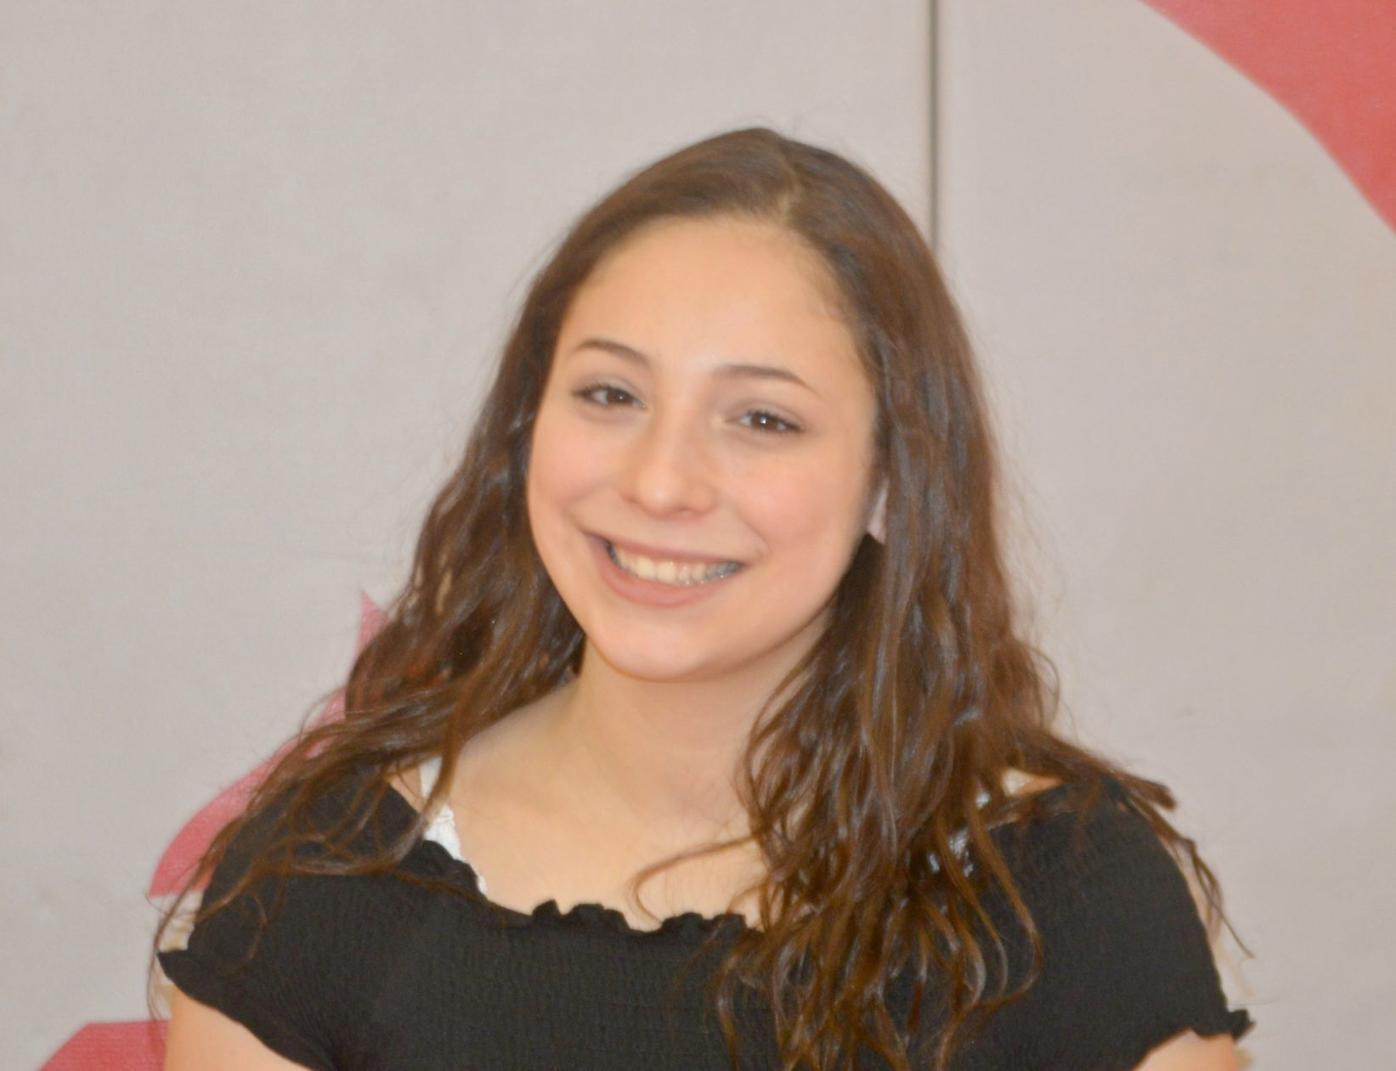 Madison Greenburg